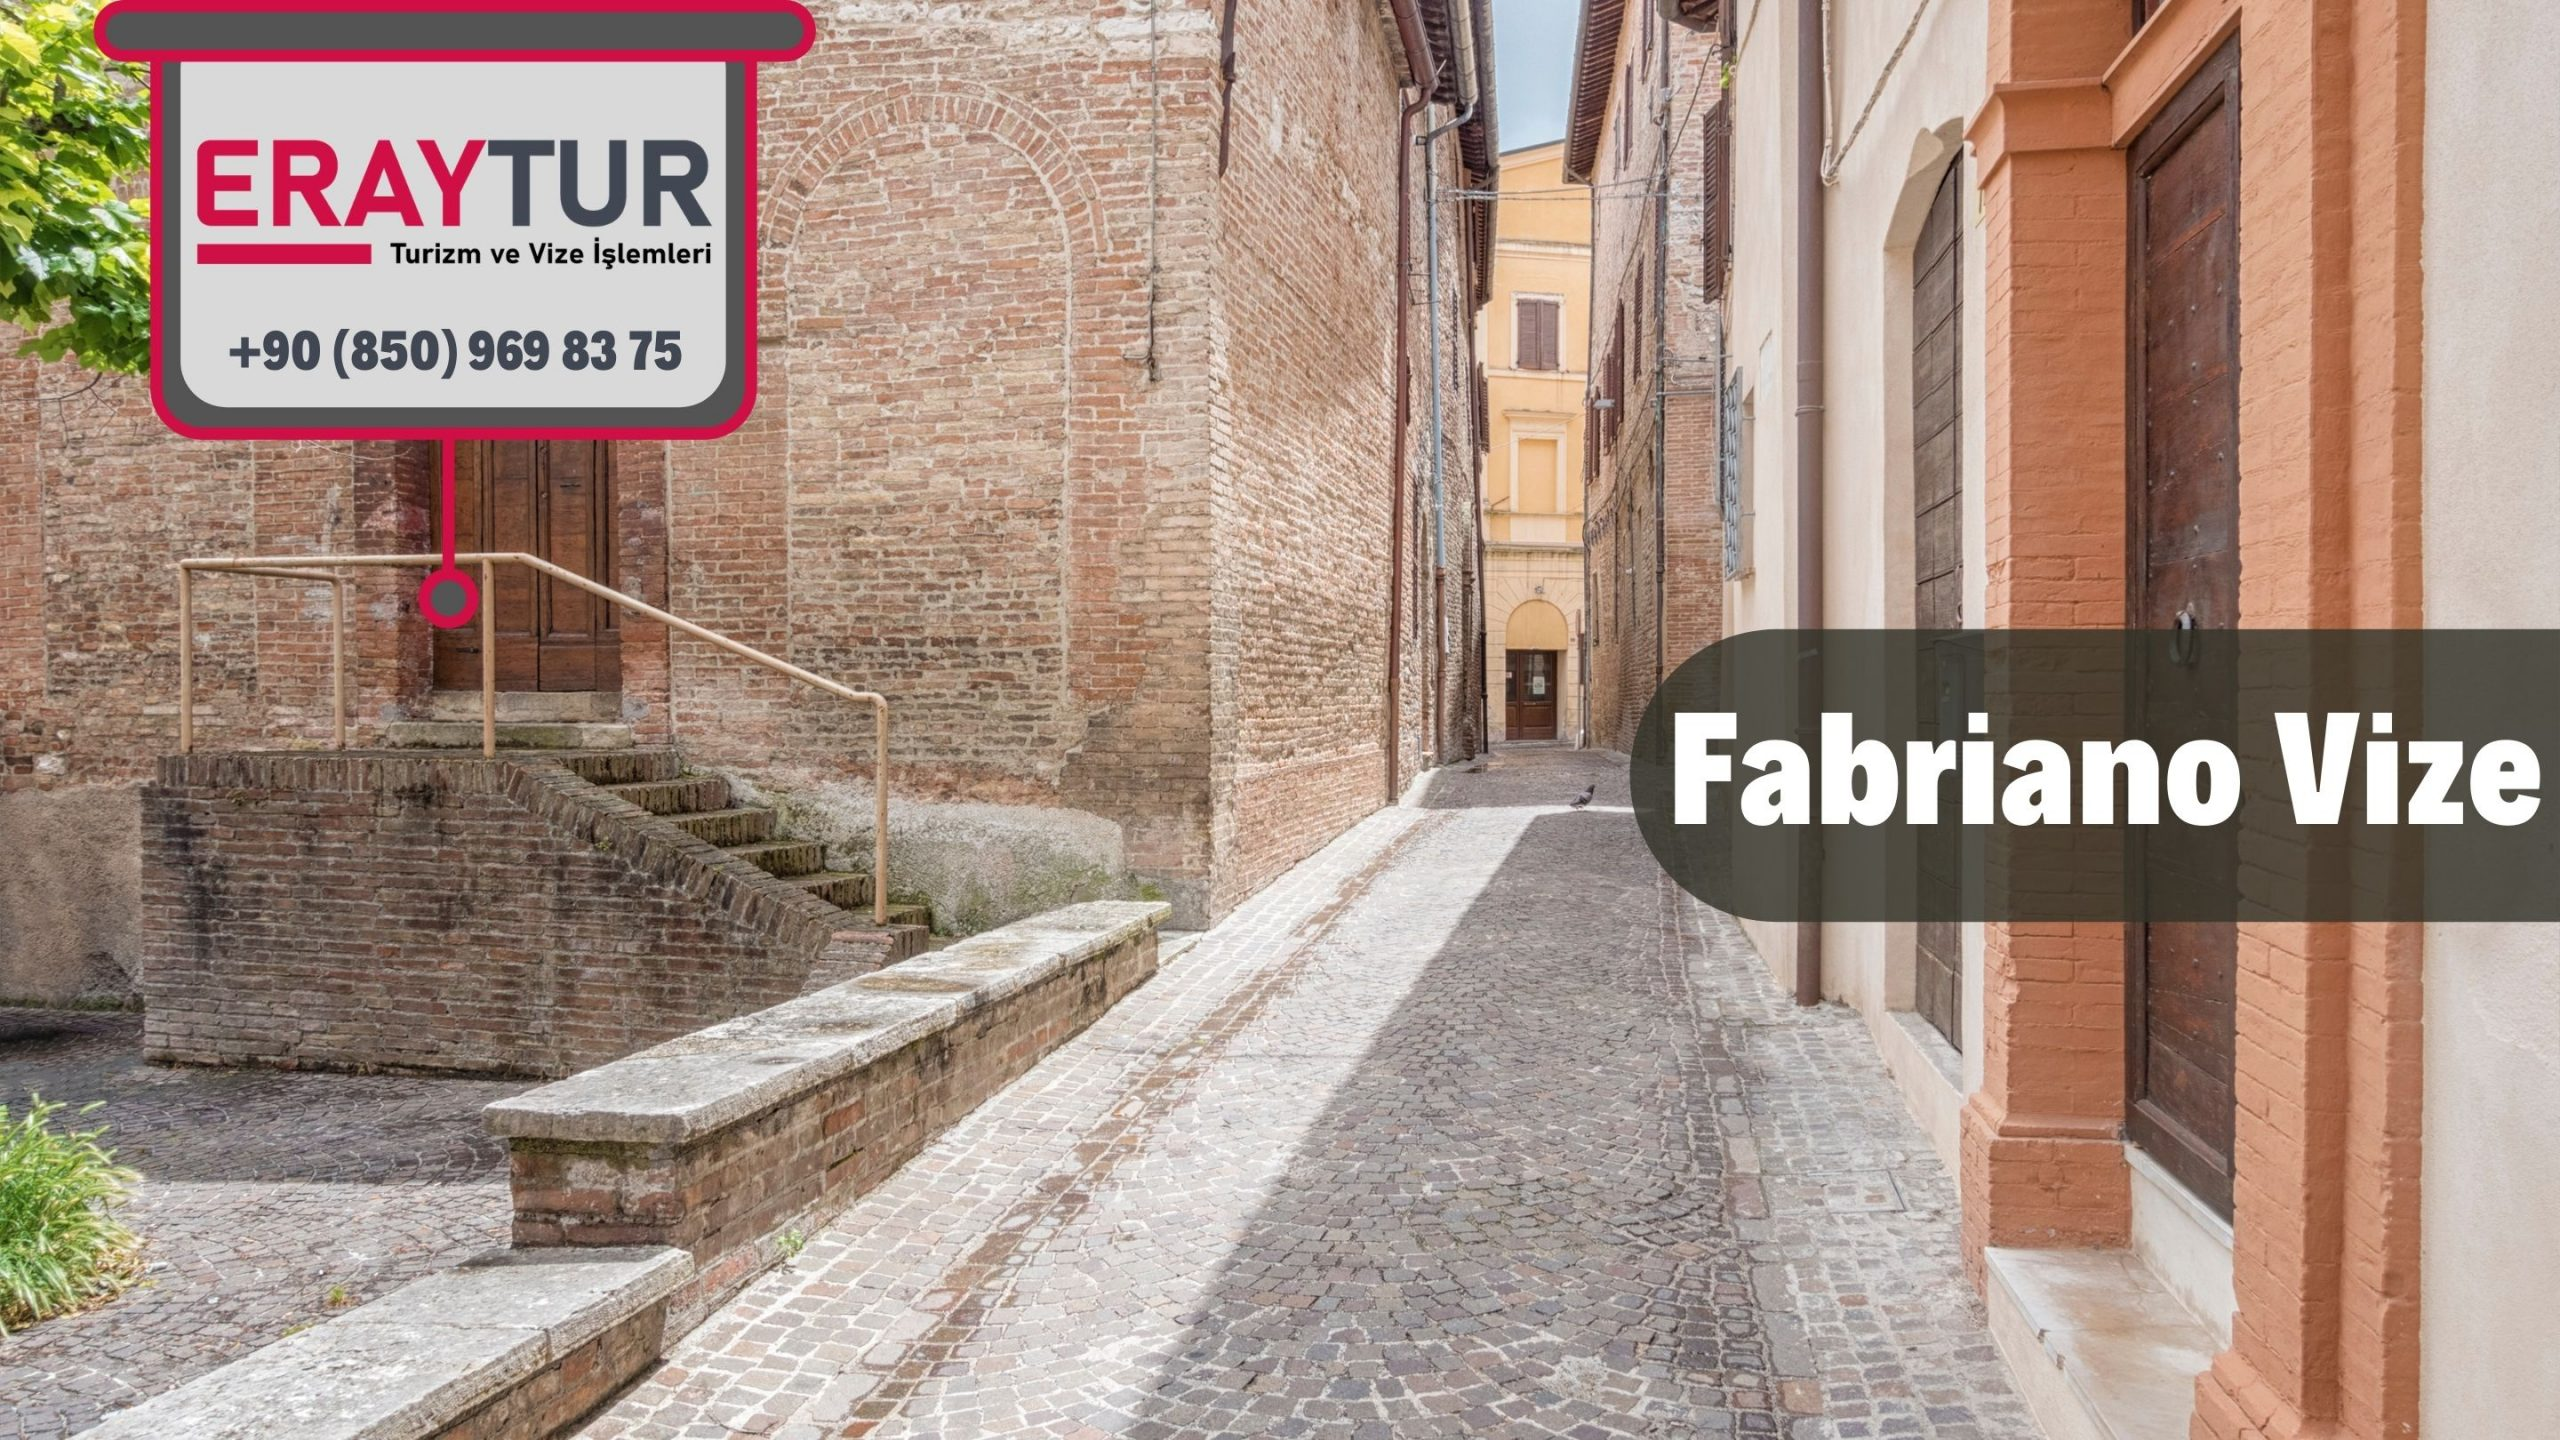 İtalya Fabriano Vize Başvurusu